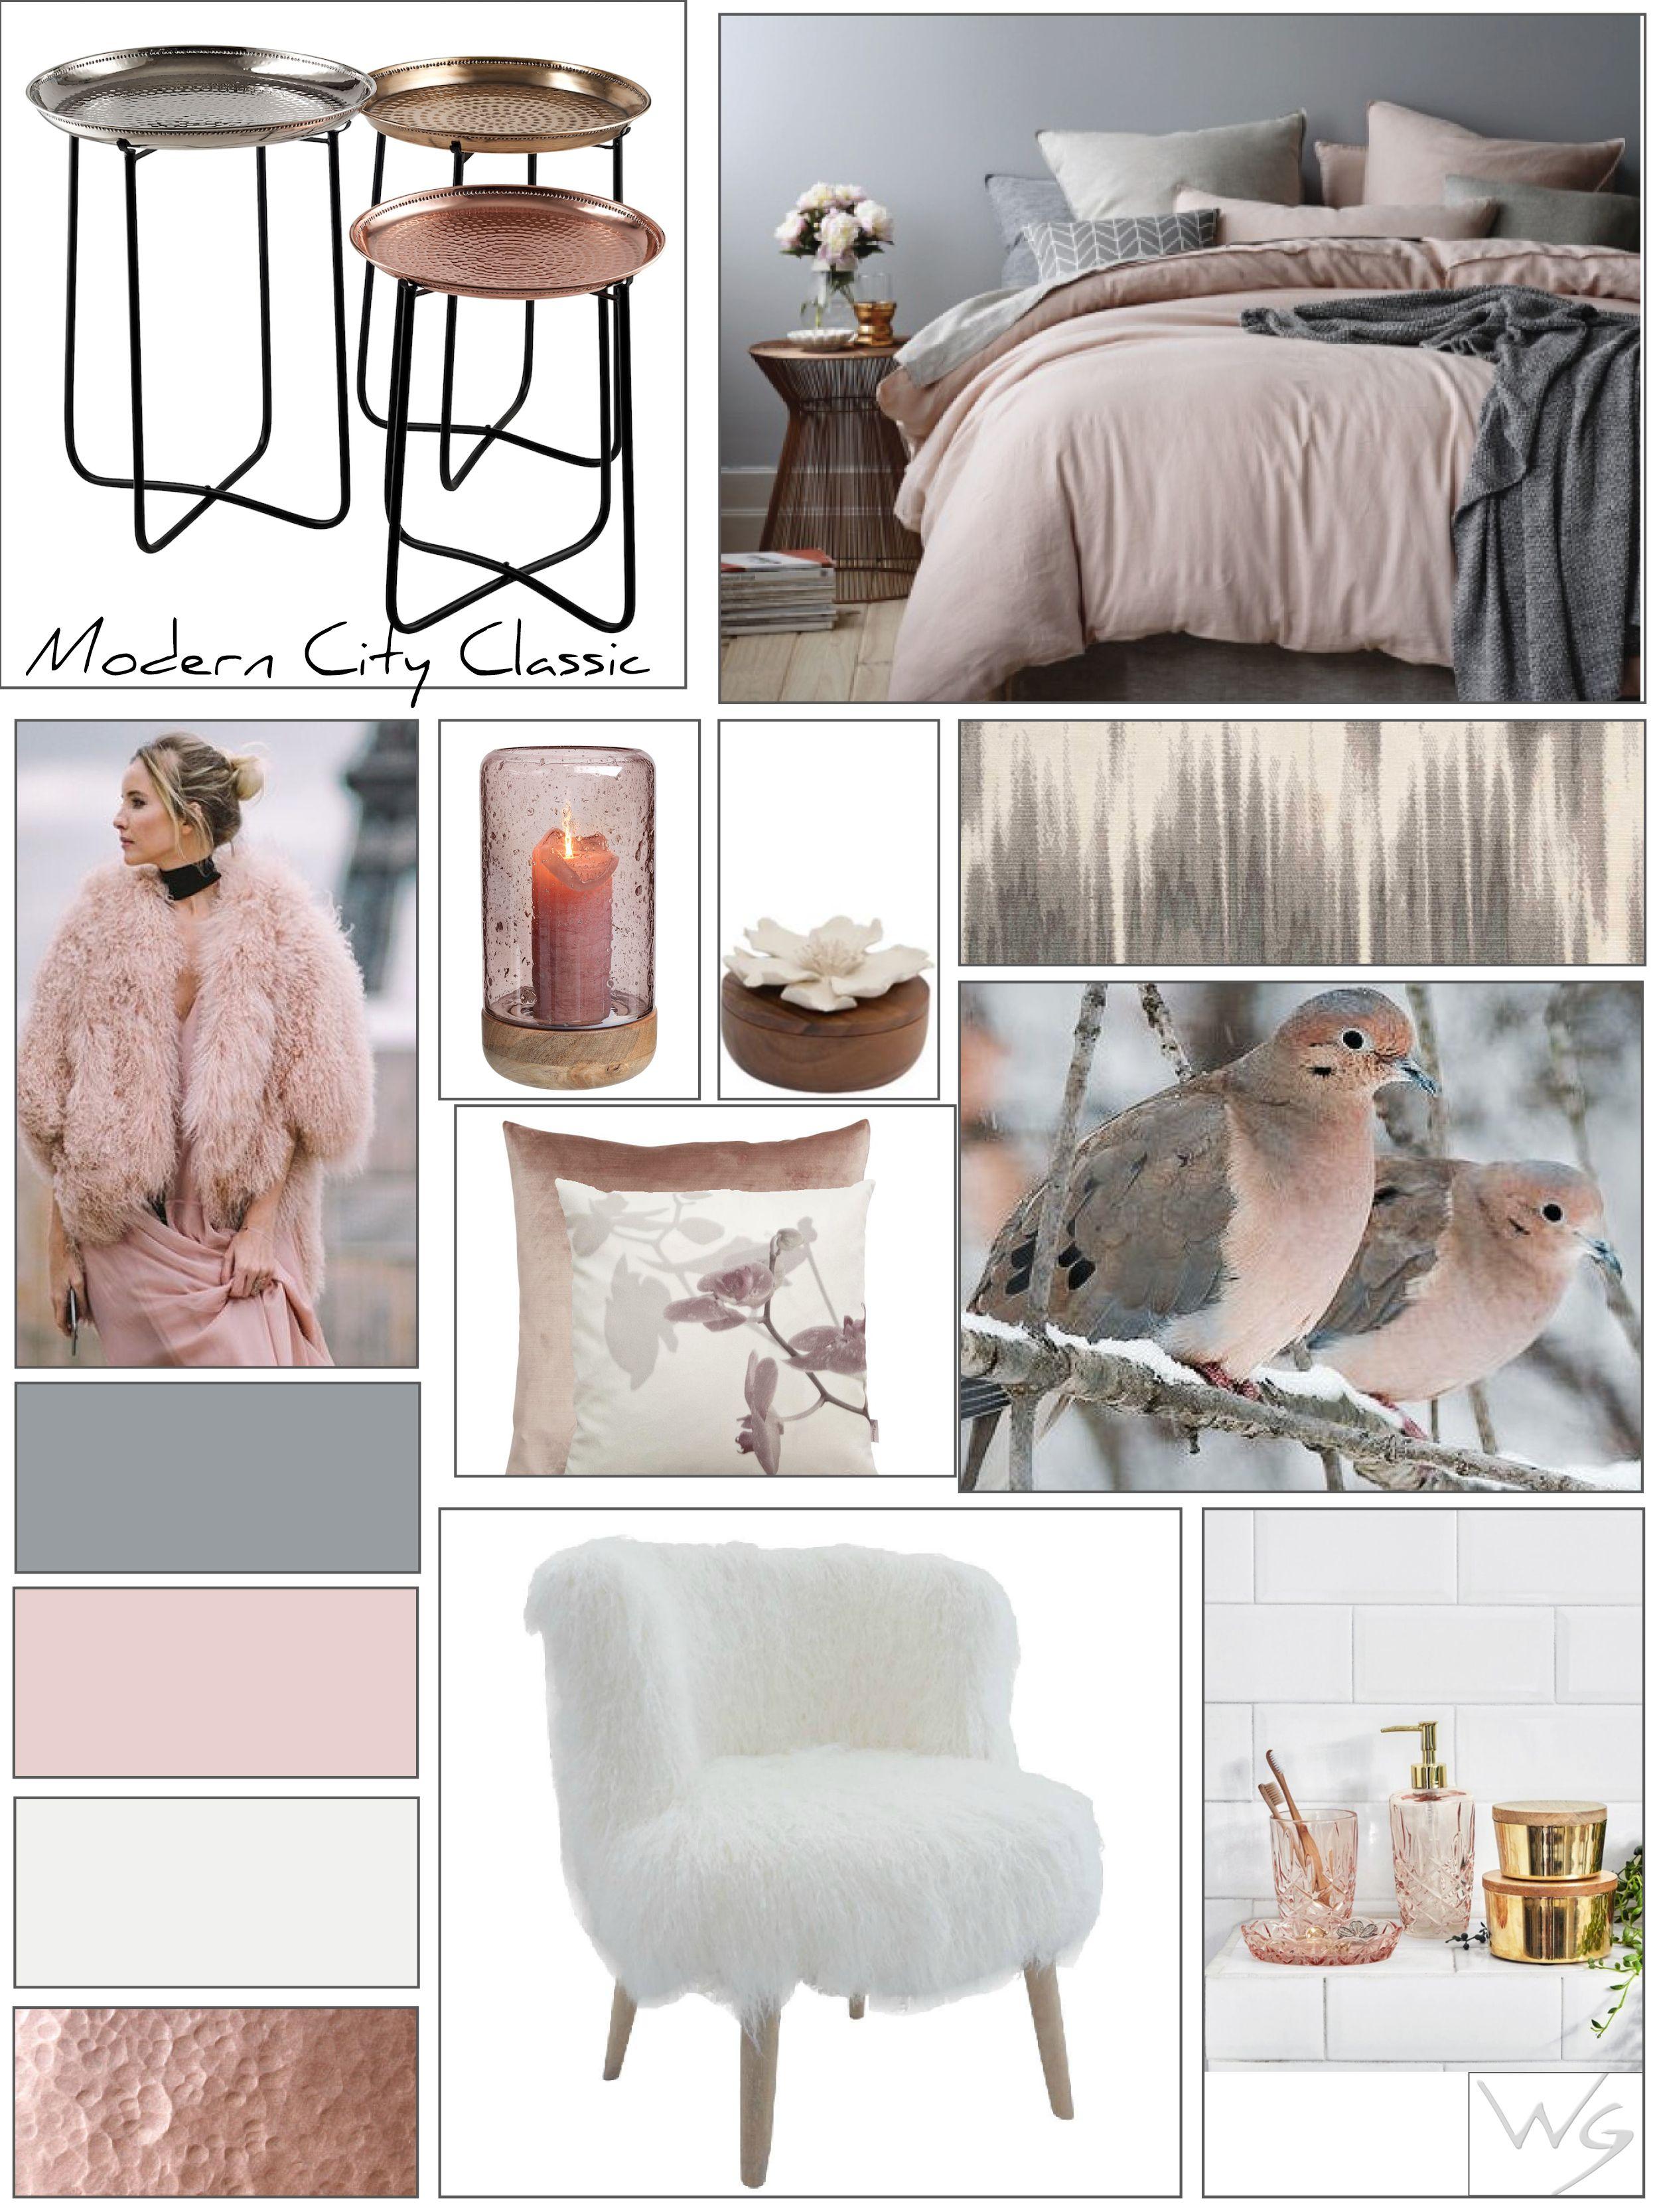 2016/7 Color Trend Blush Pink. Beautiful Mood Board